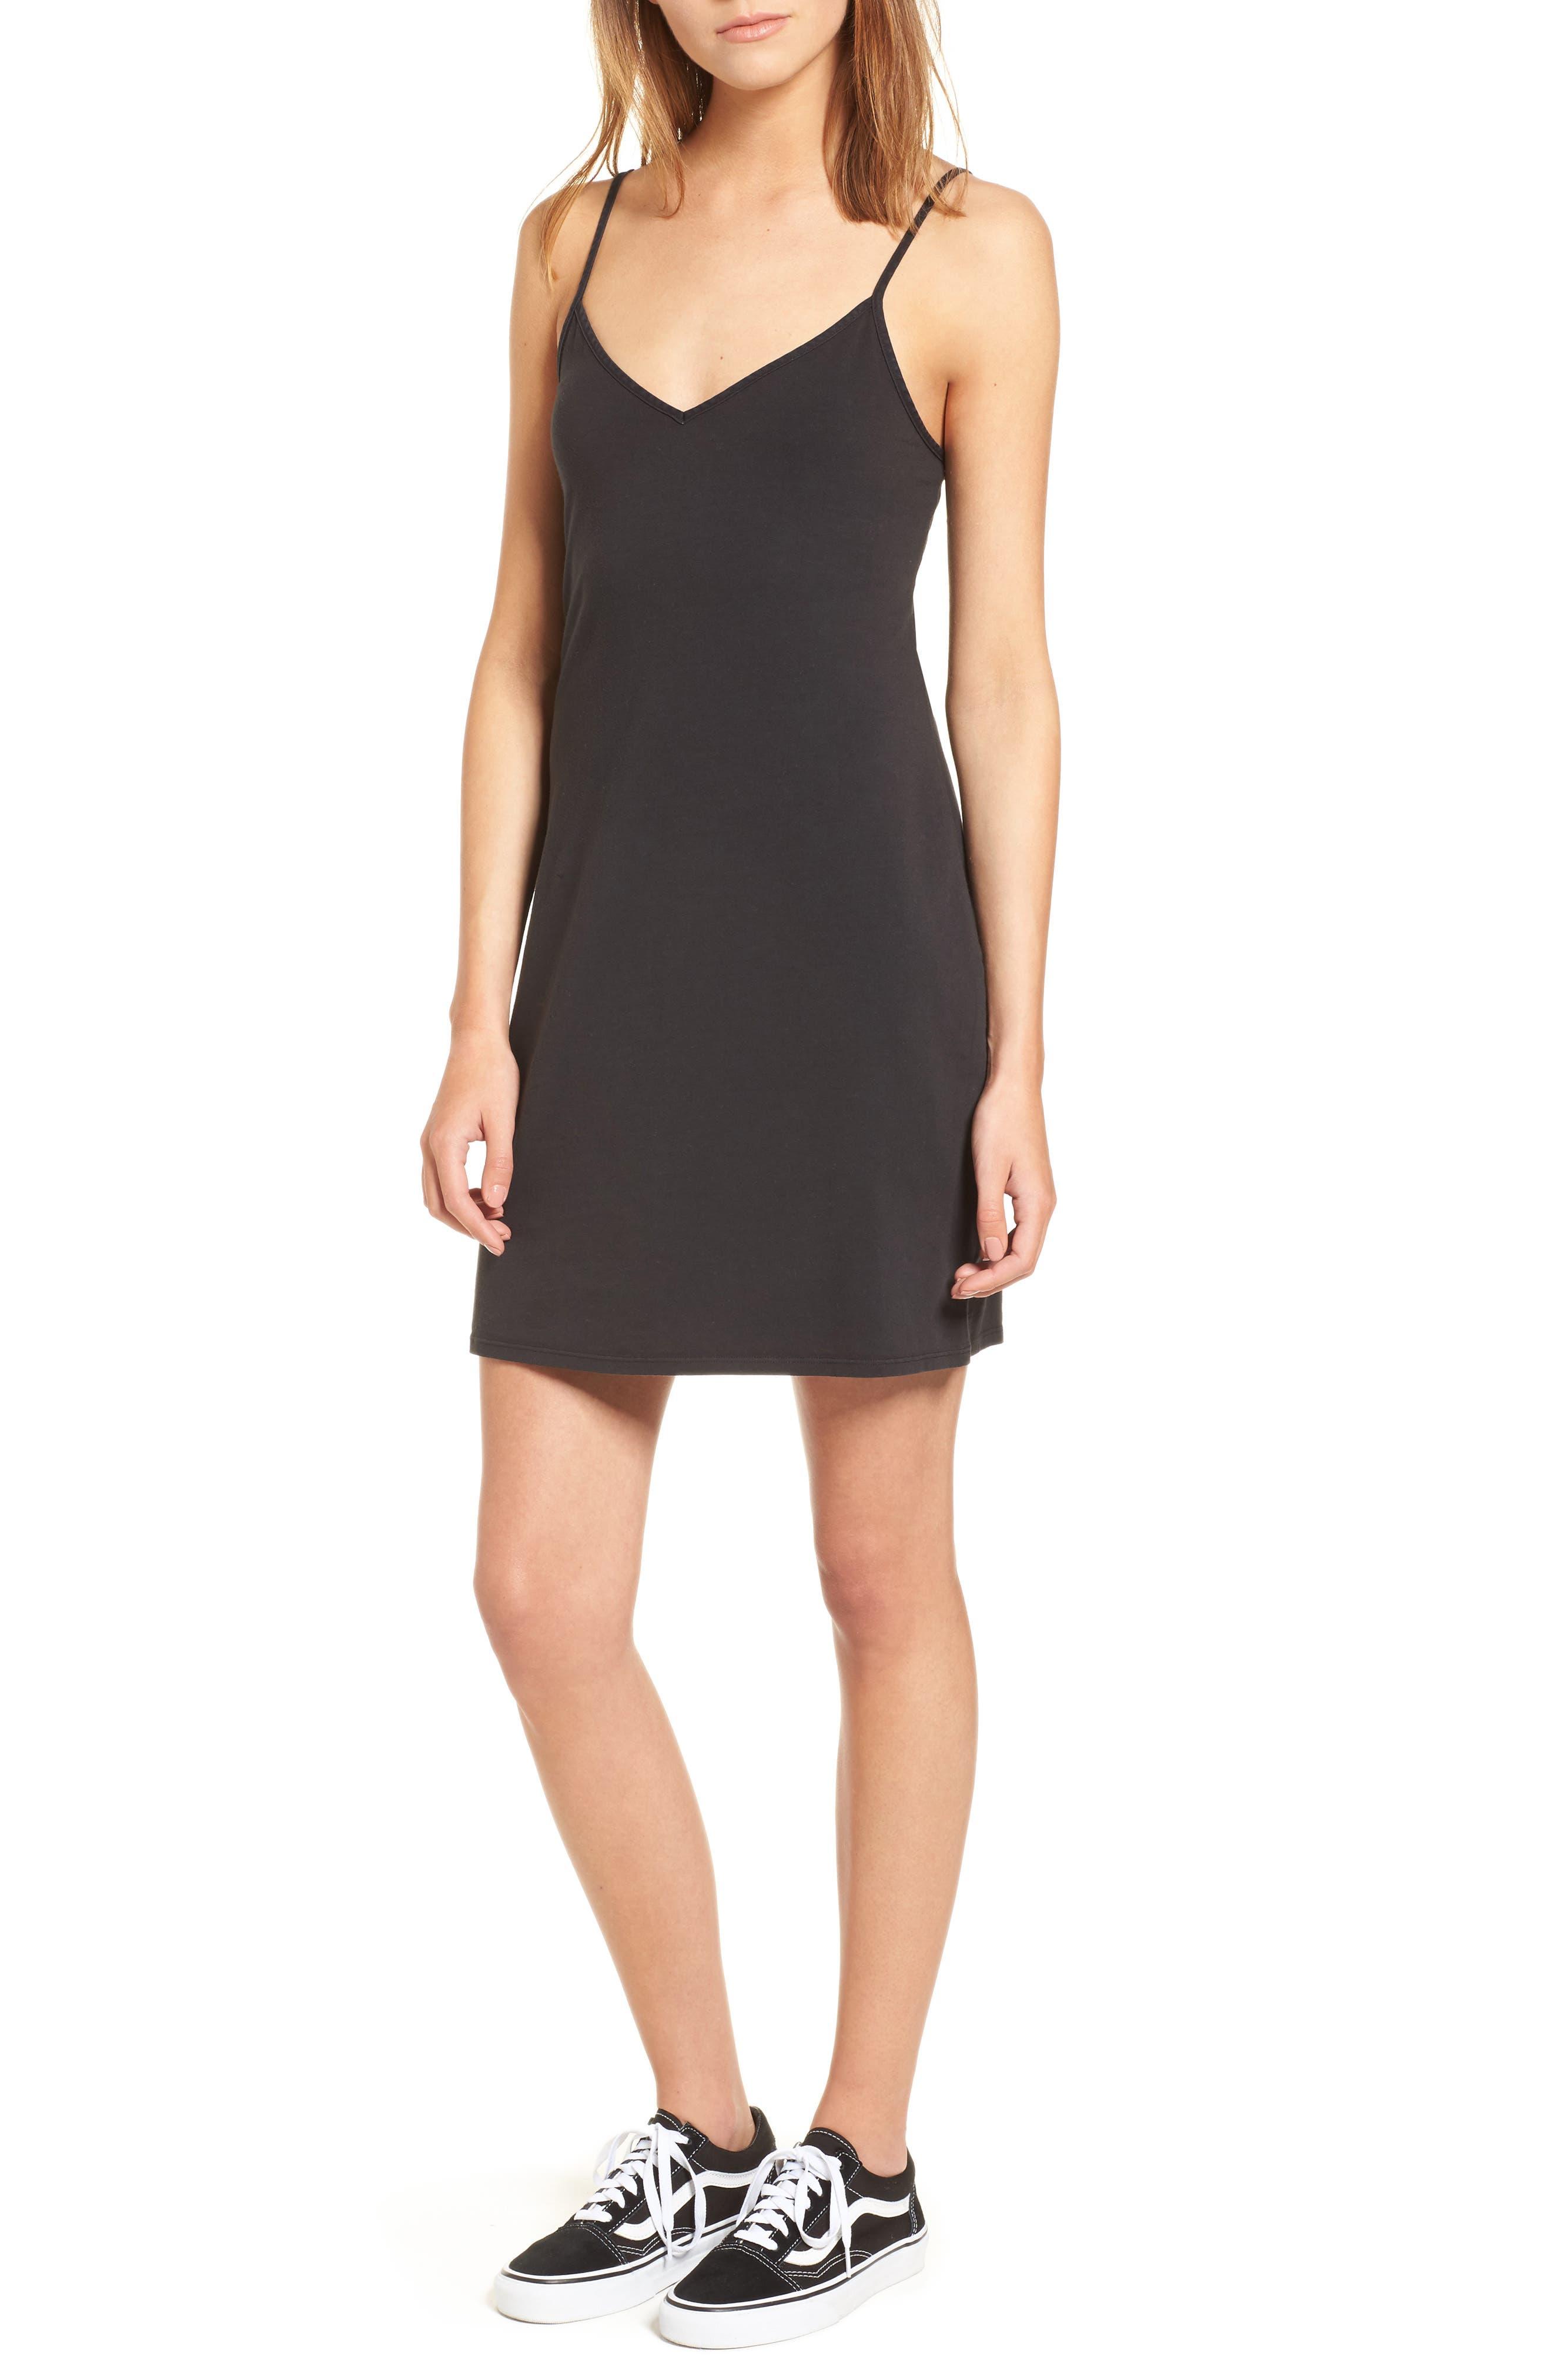 Darcie Dress,                         Main,                         color, 005